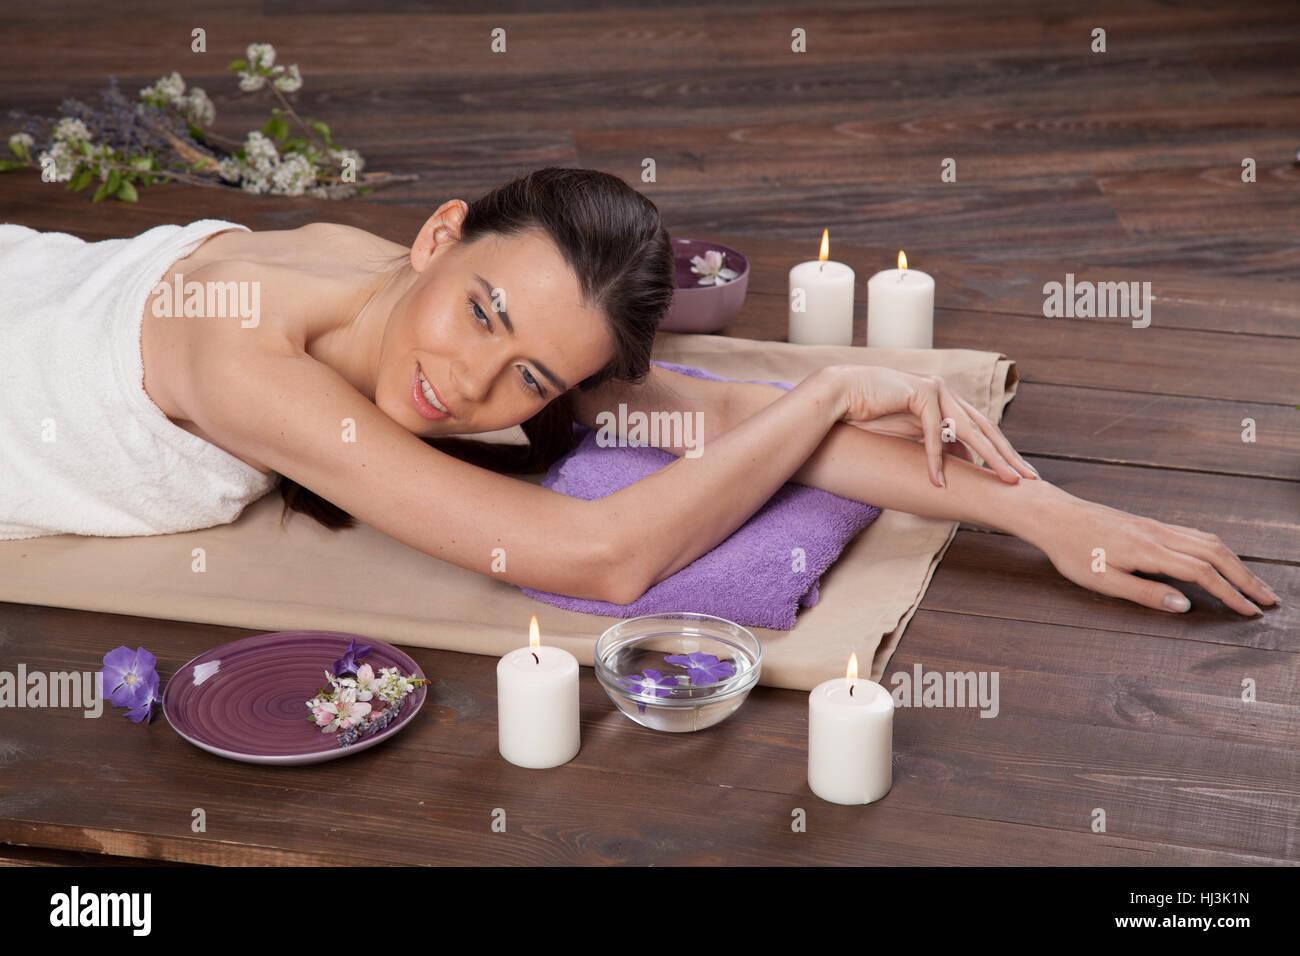 girl spa massage sauna relaxation bath stock photo: 131617185 - alamy